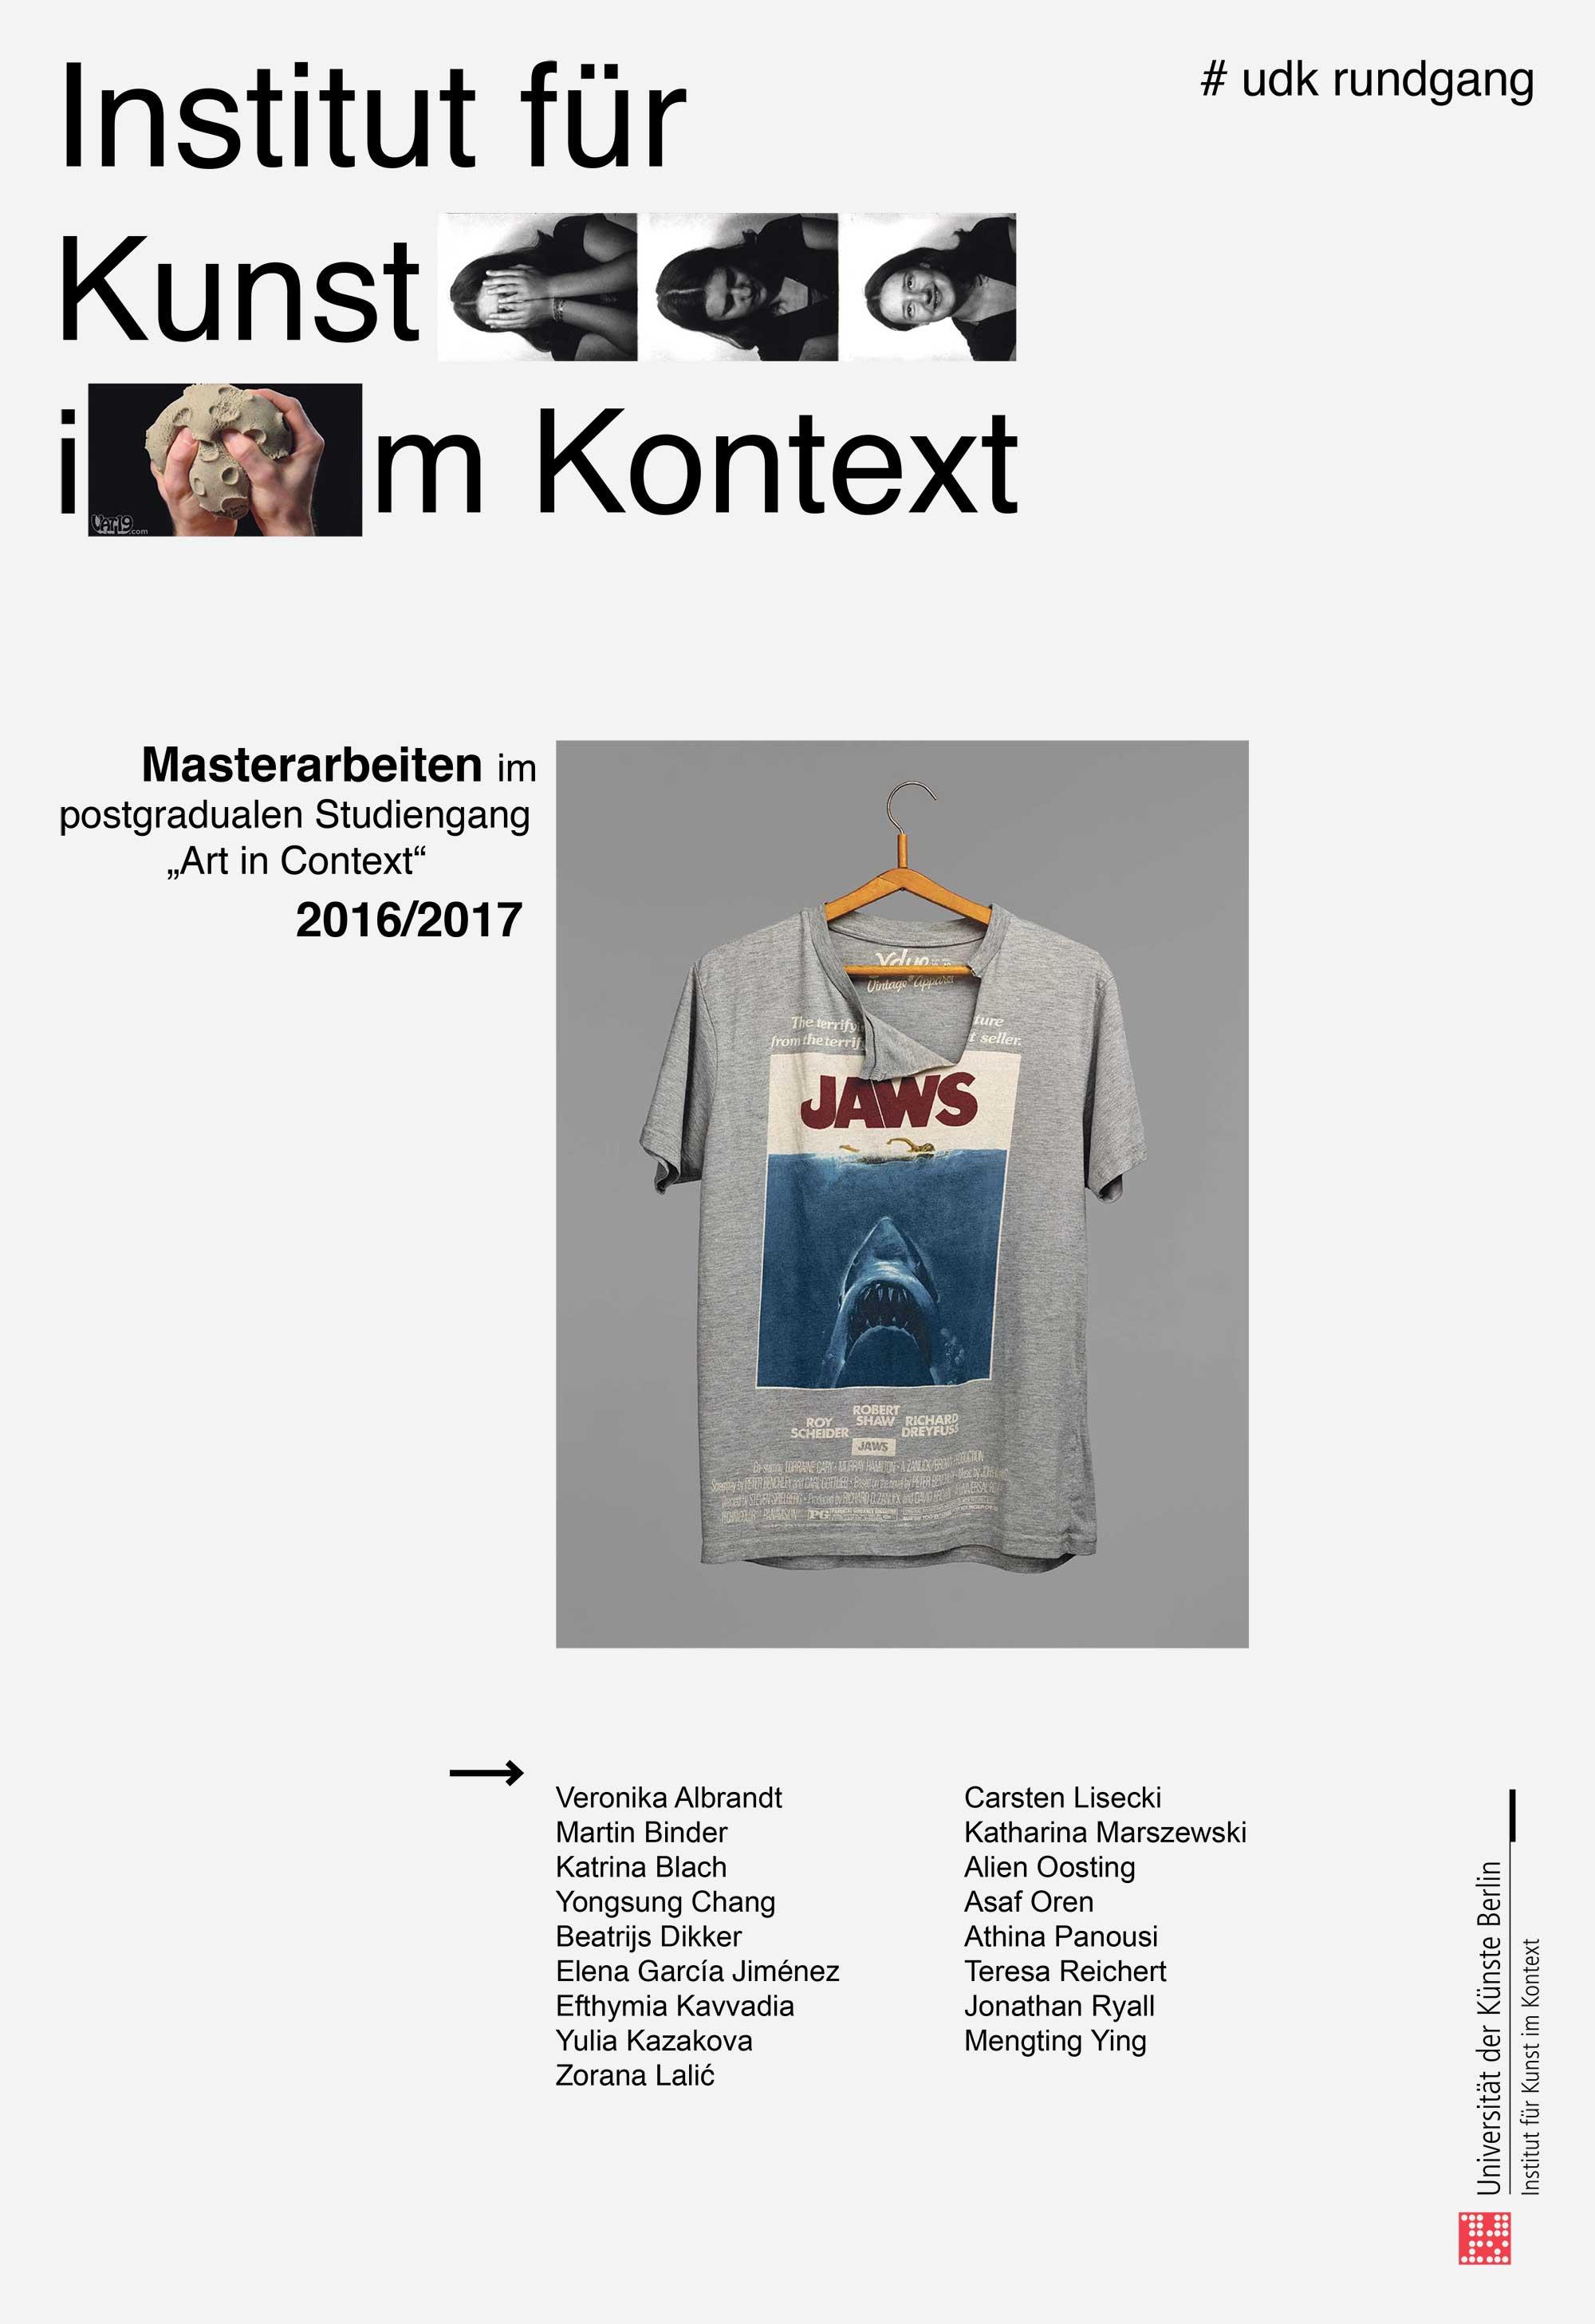 Art in Context, udk berlin, Kunst im Kontext, Masterarbeiten art in context 2017, Institut für Kunst im Kontext